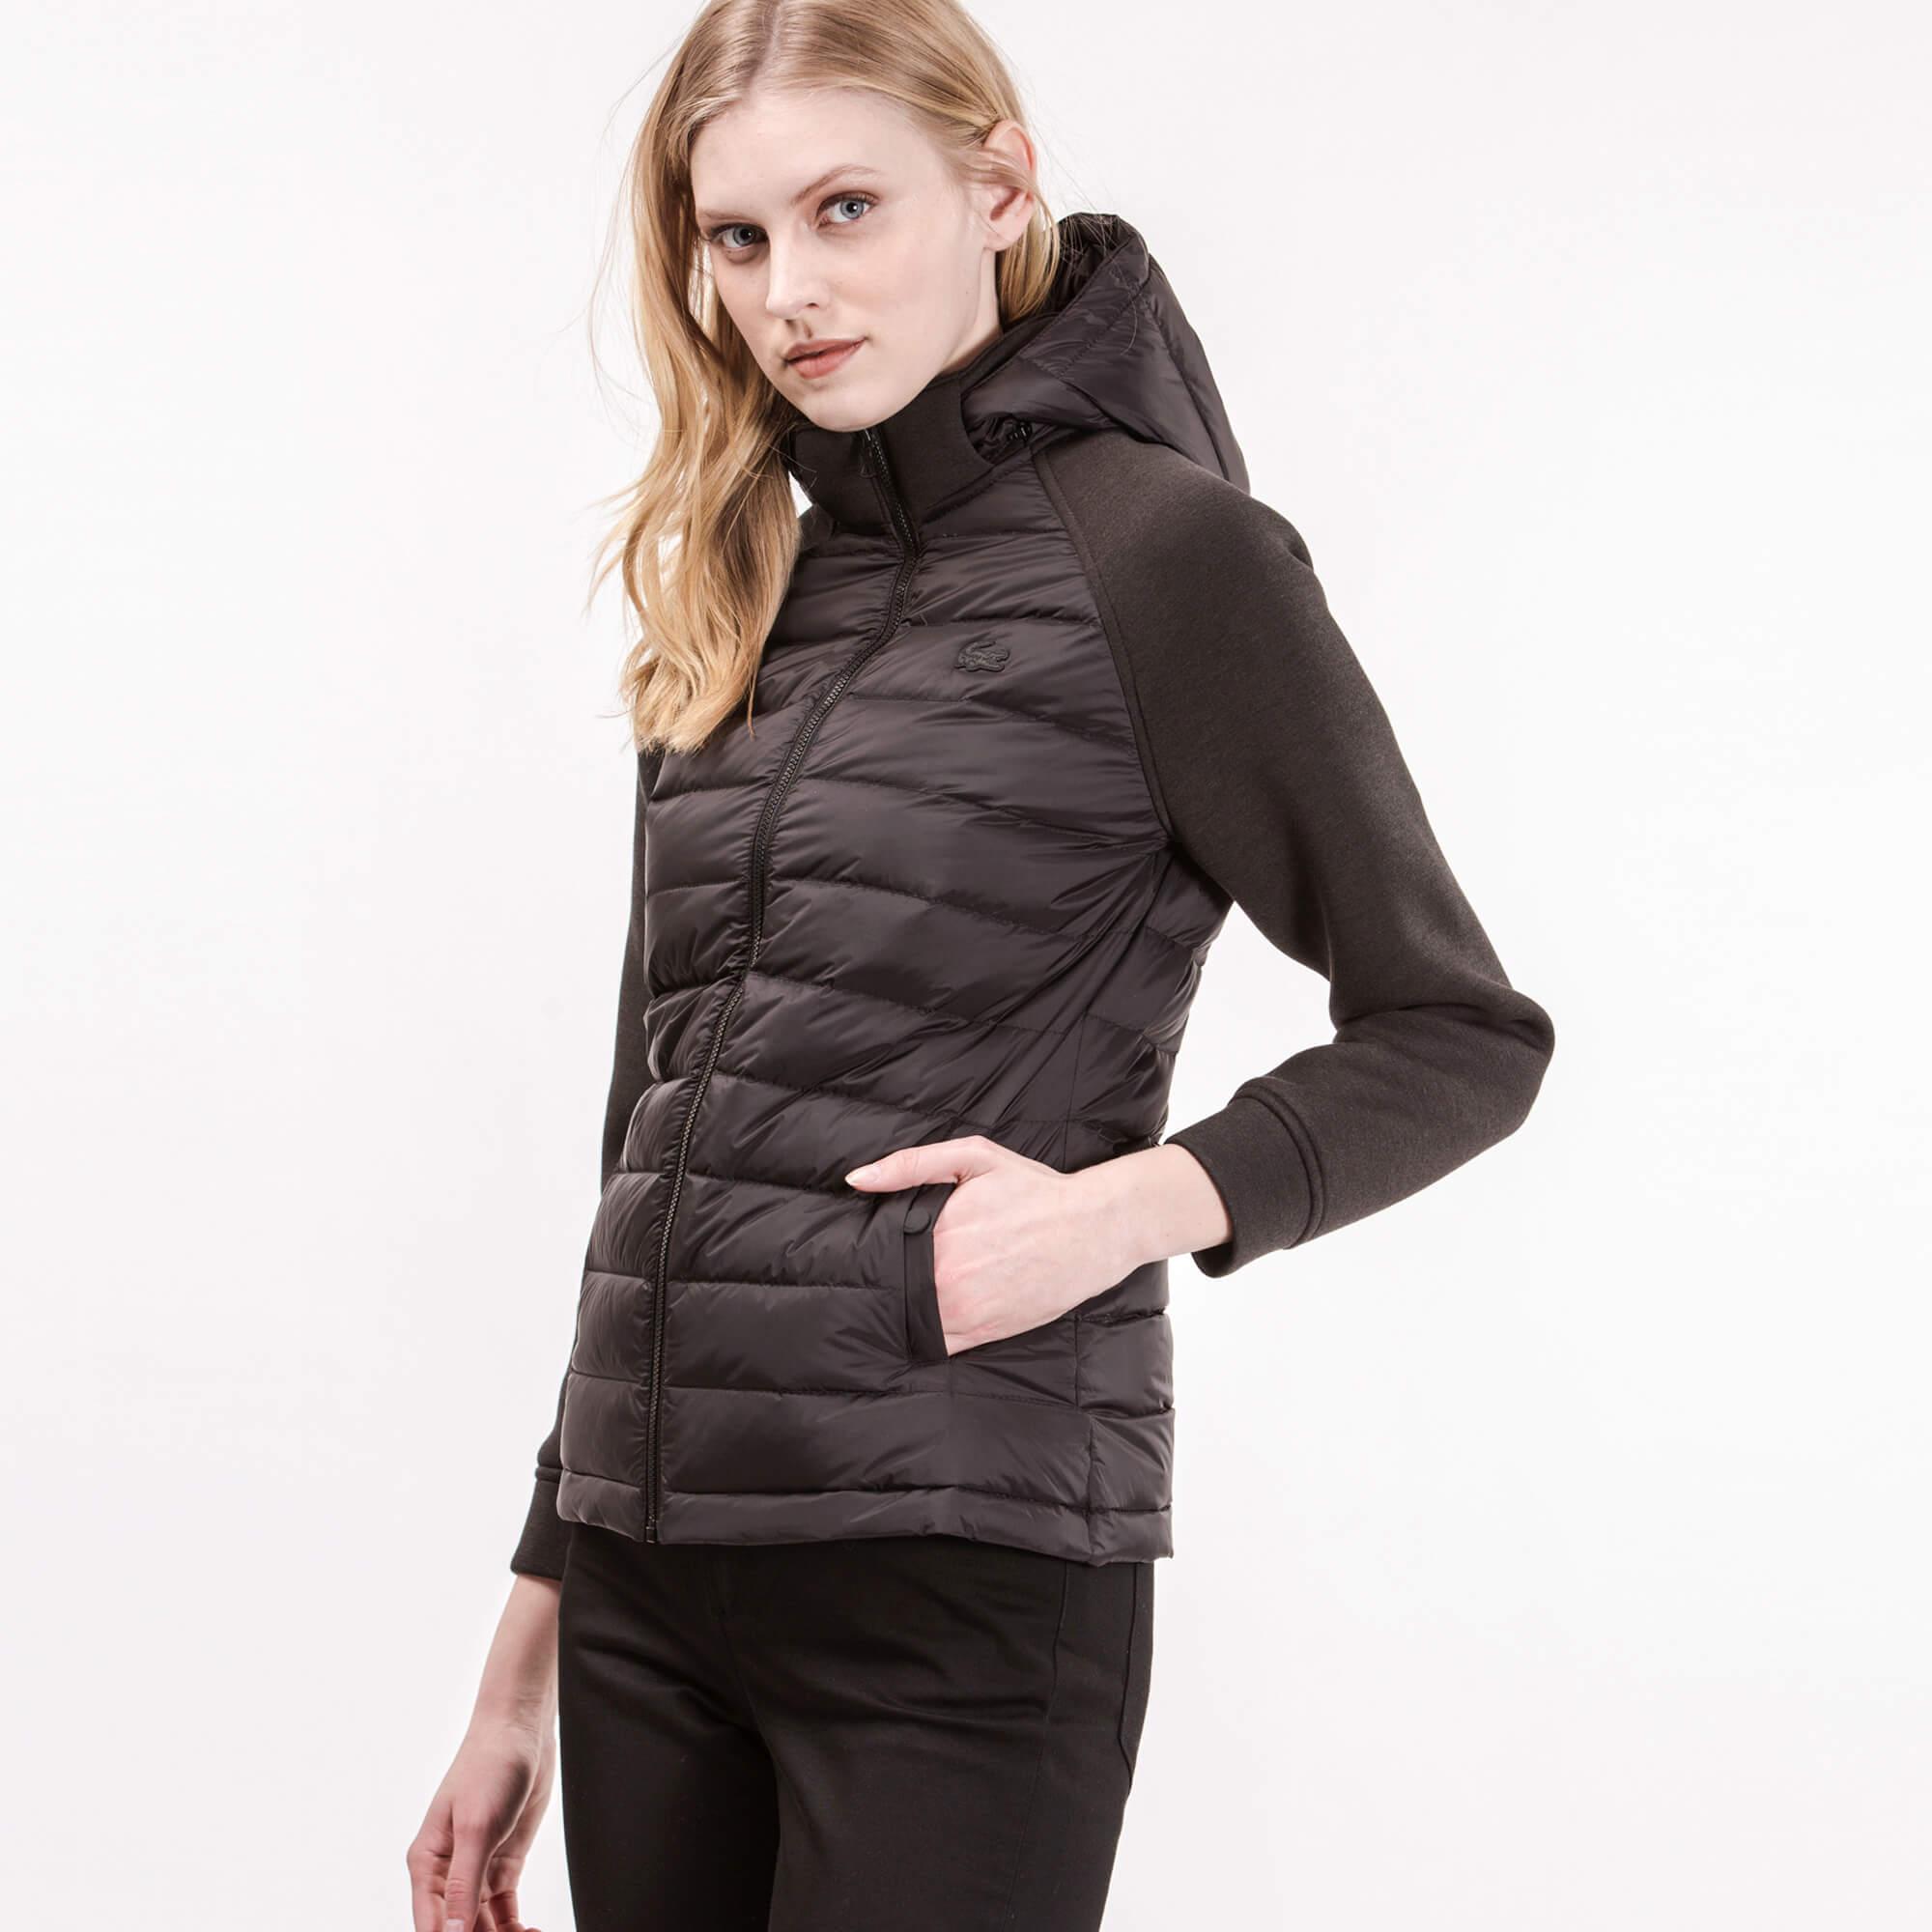 Фото 2 - Куртку Lacoste черного цвета